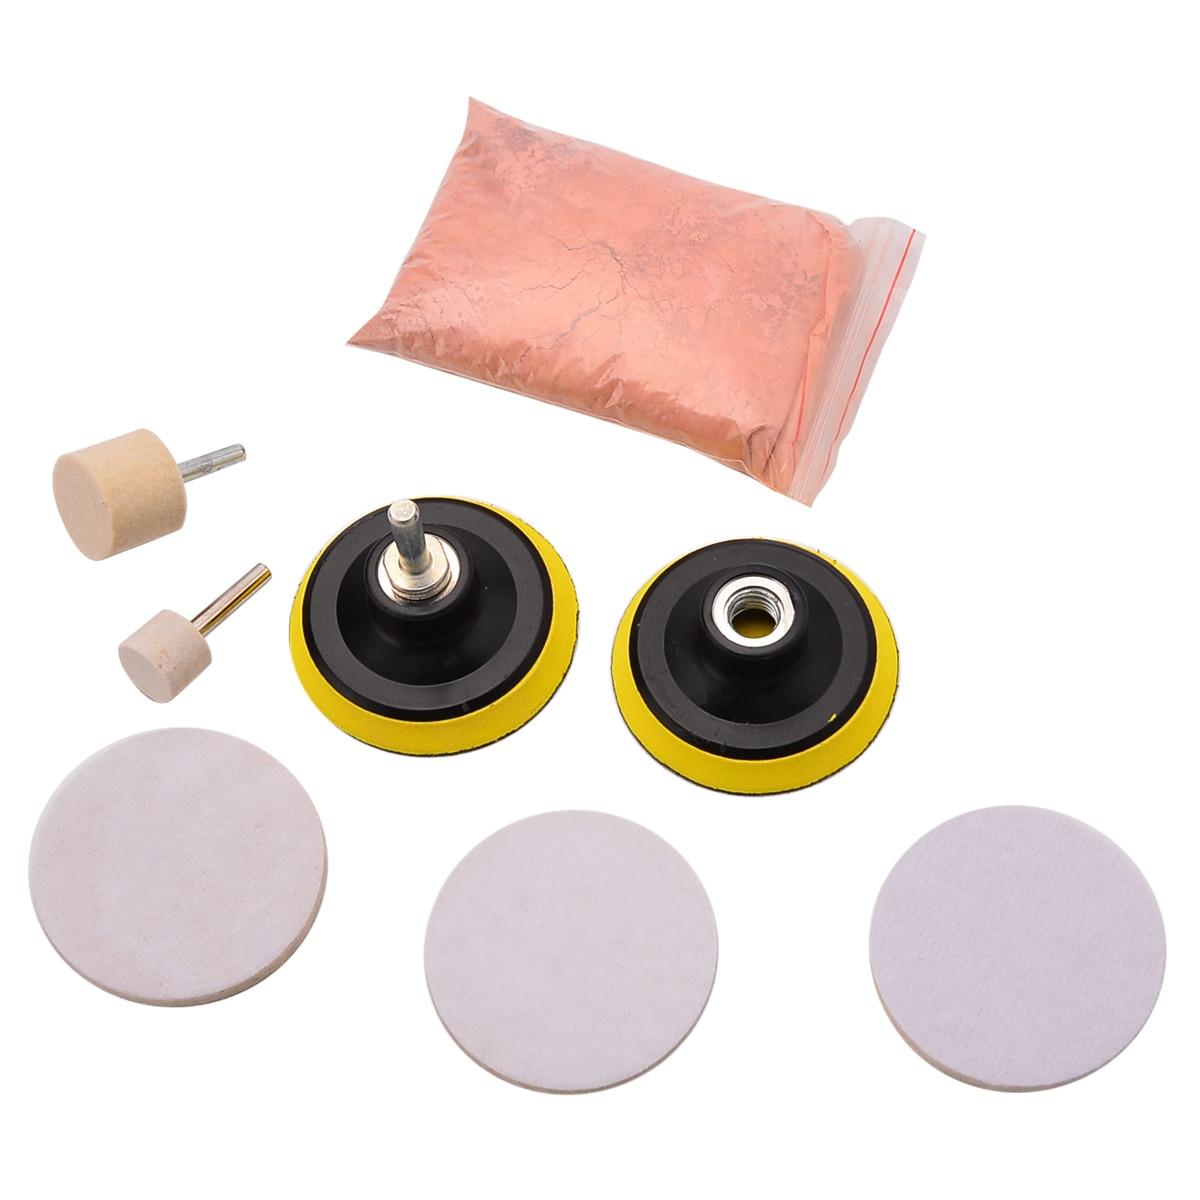 9pcs/set Car Front Window Glass Polishing Pad Kit Glass Scratch Remover 8 Oz Cerium Oxide + 3